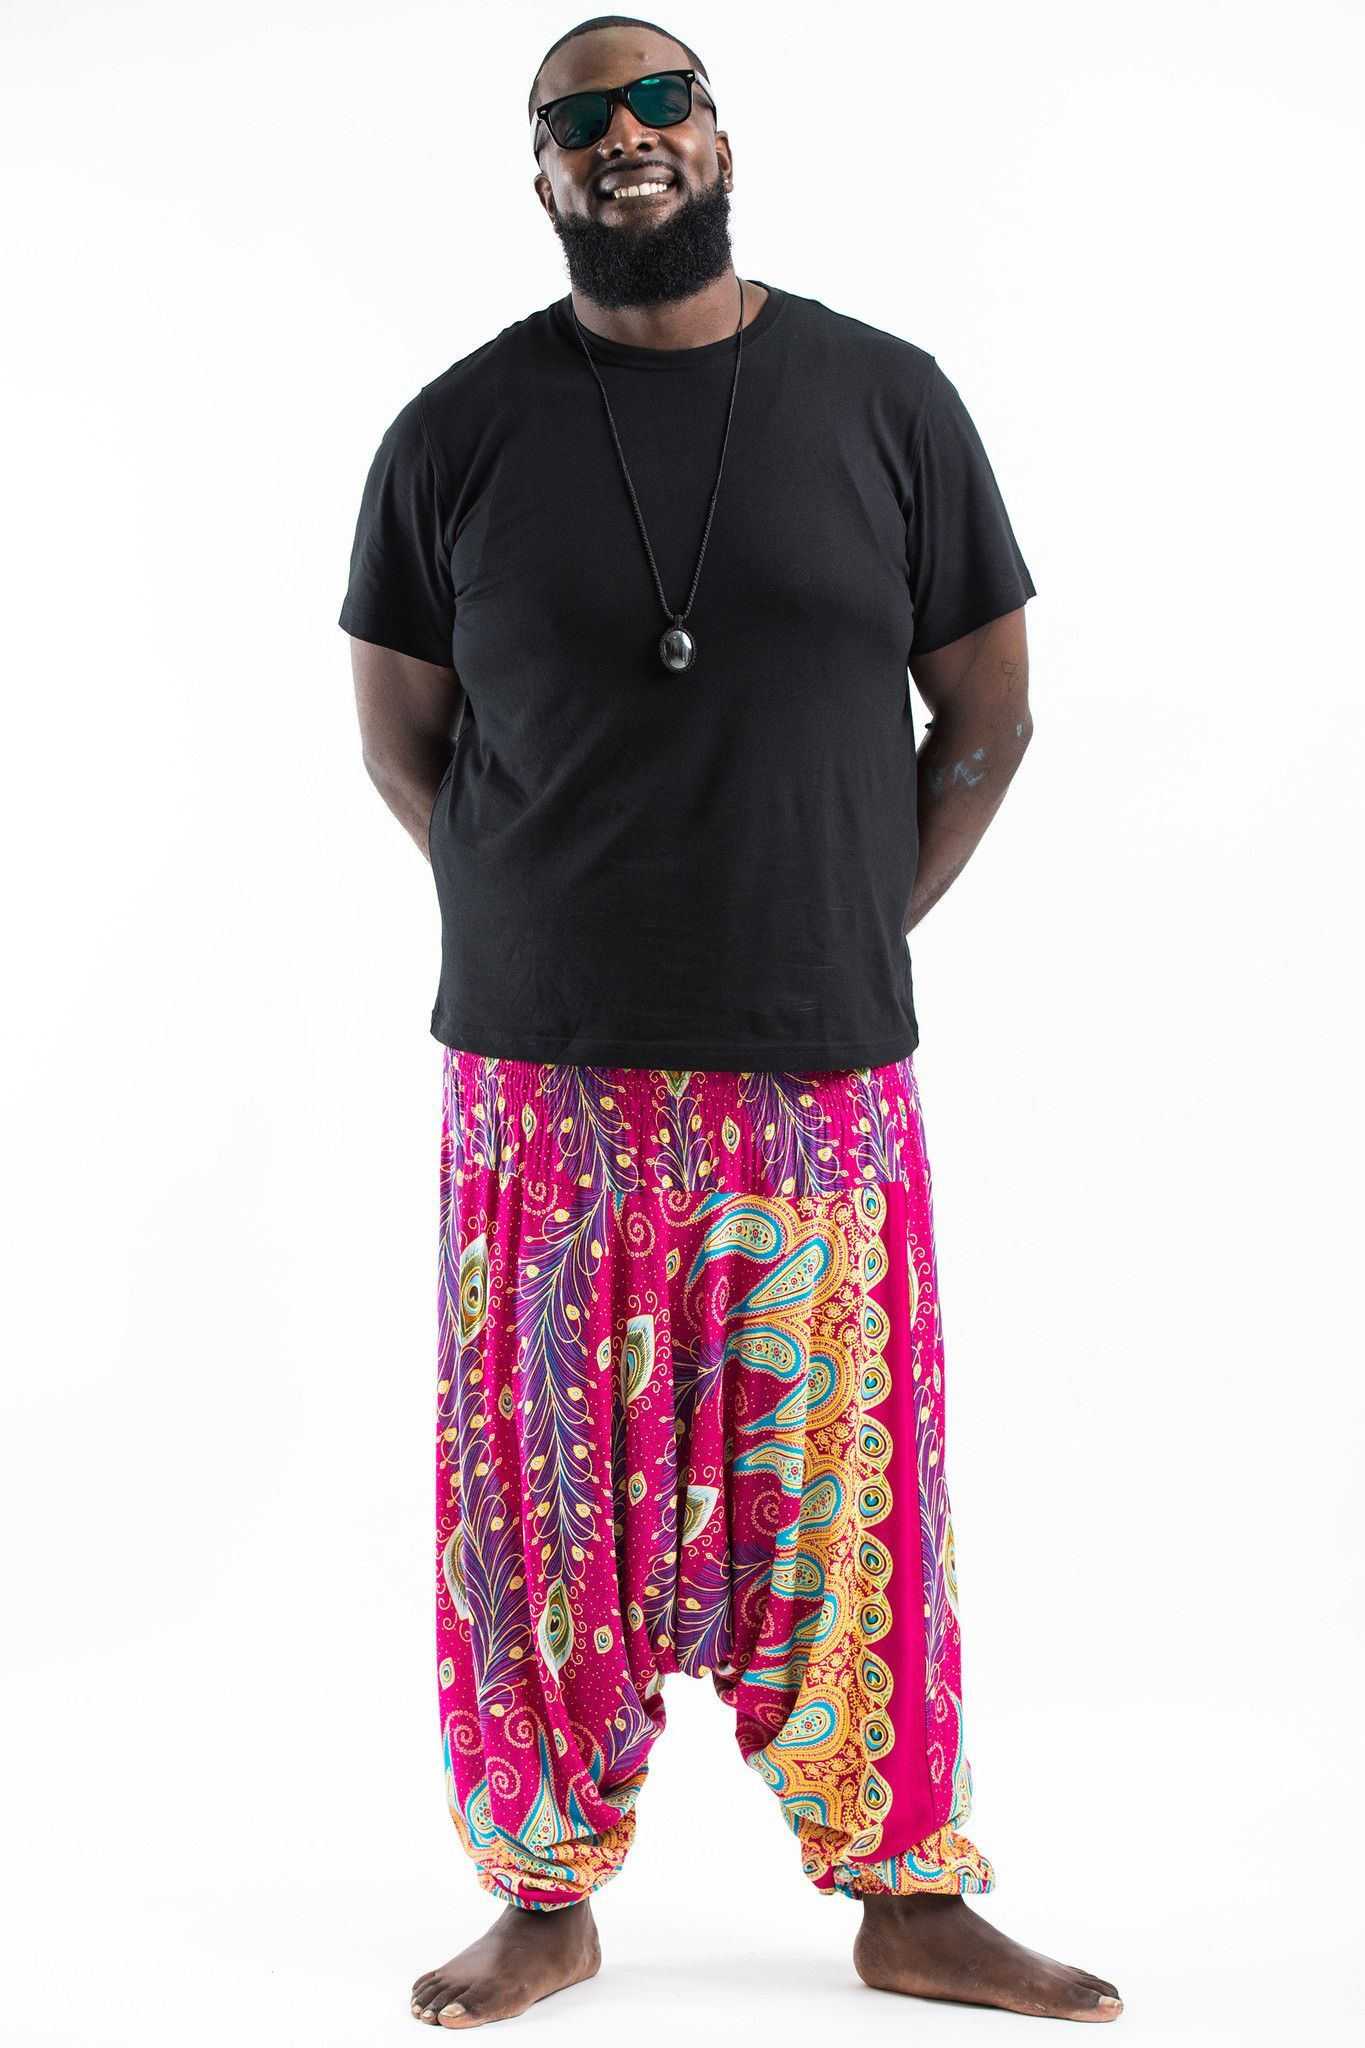 d32a14bec25a9 Plus Size Peacock Paisley Drop Crotch Men s Harem Pants in Pink ...